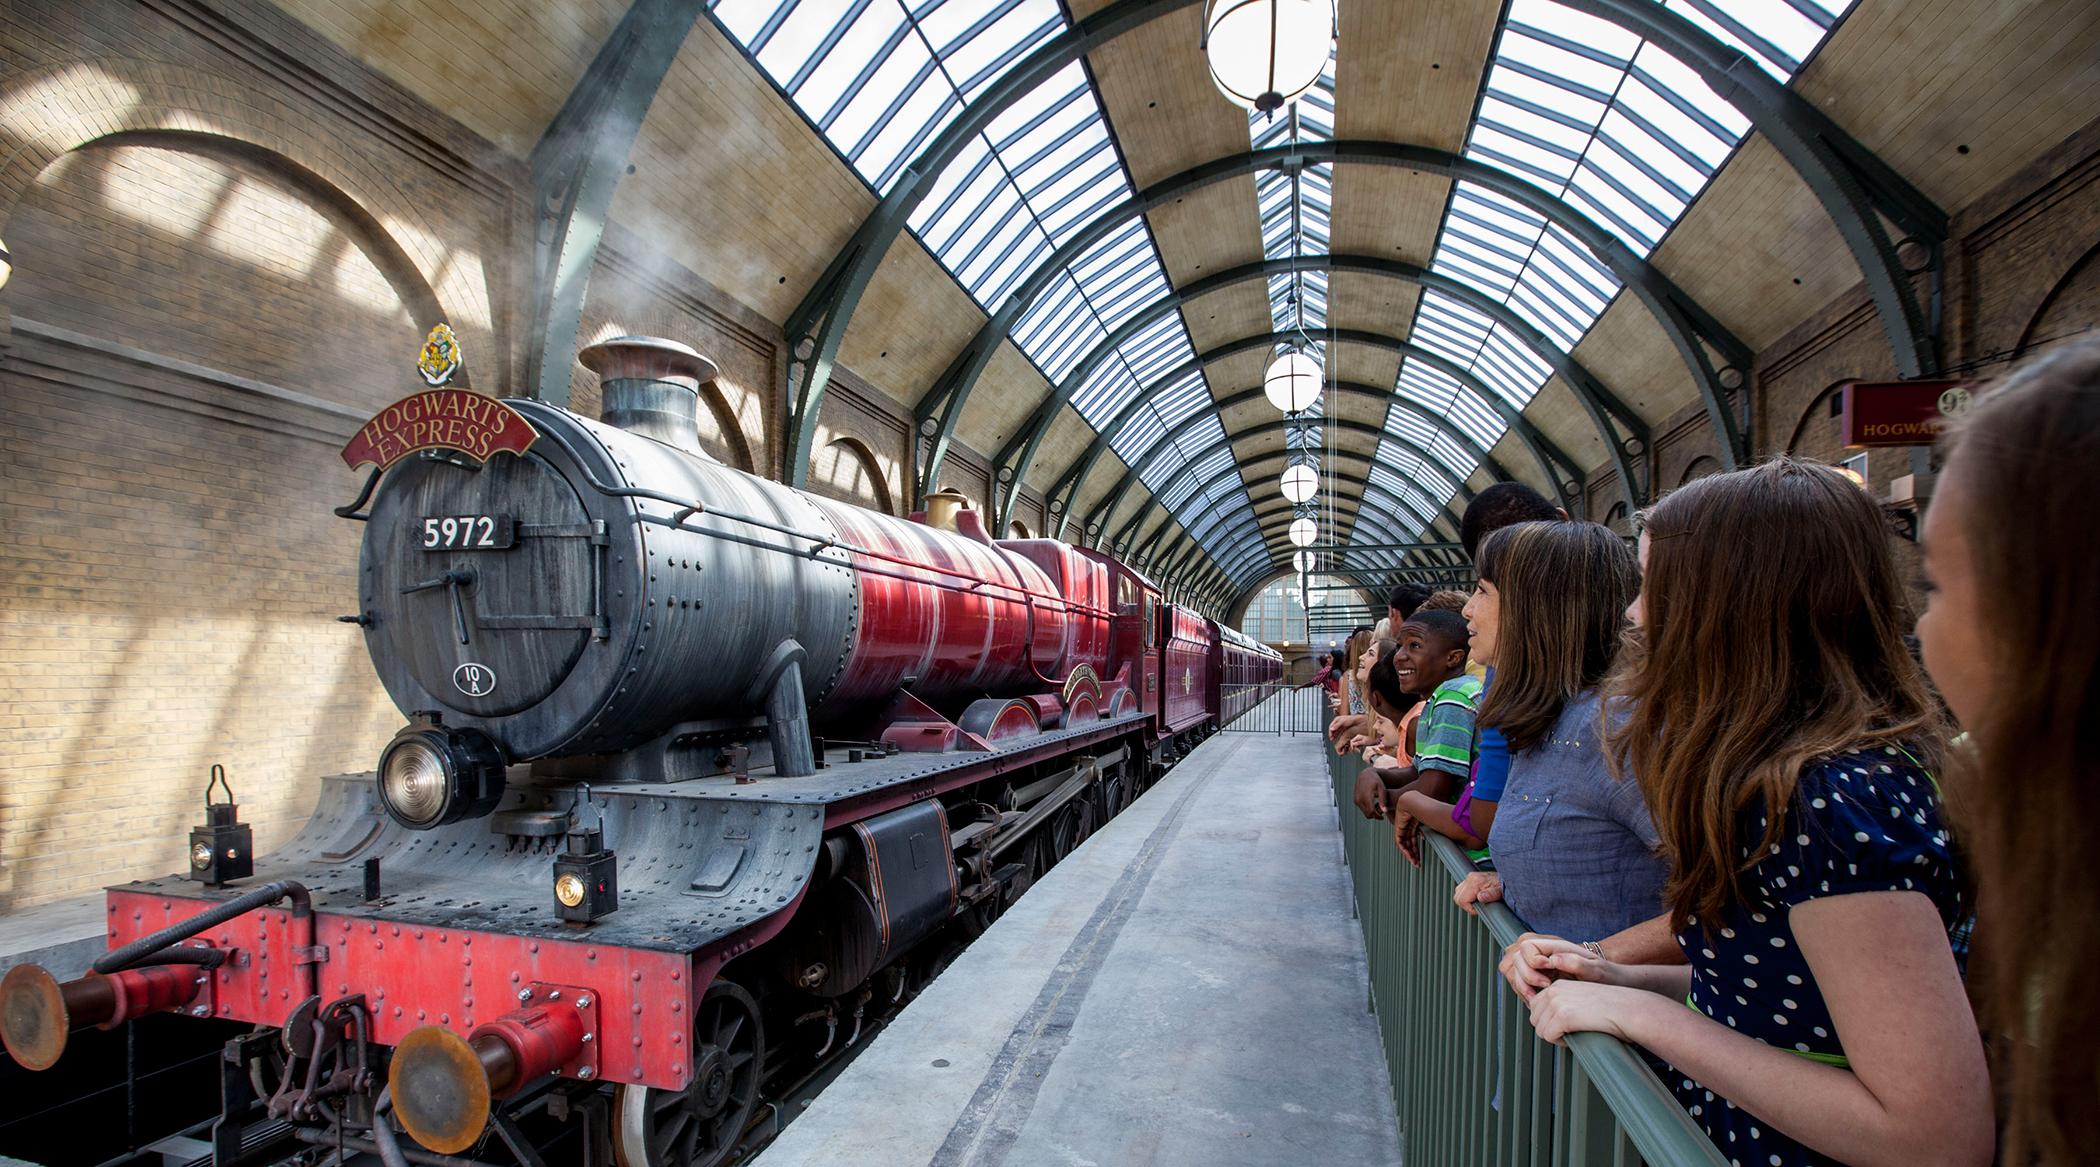 170518-universal-studios-wizarding-world-harry-potter-hogwarts-express